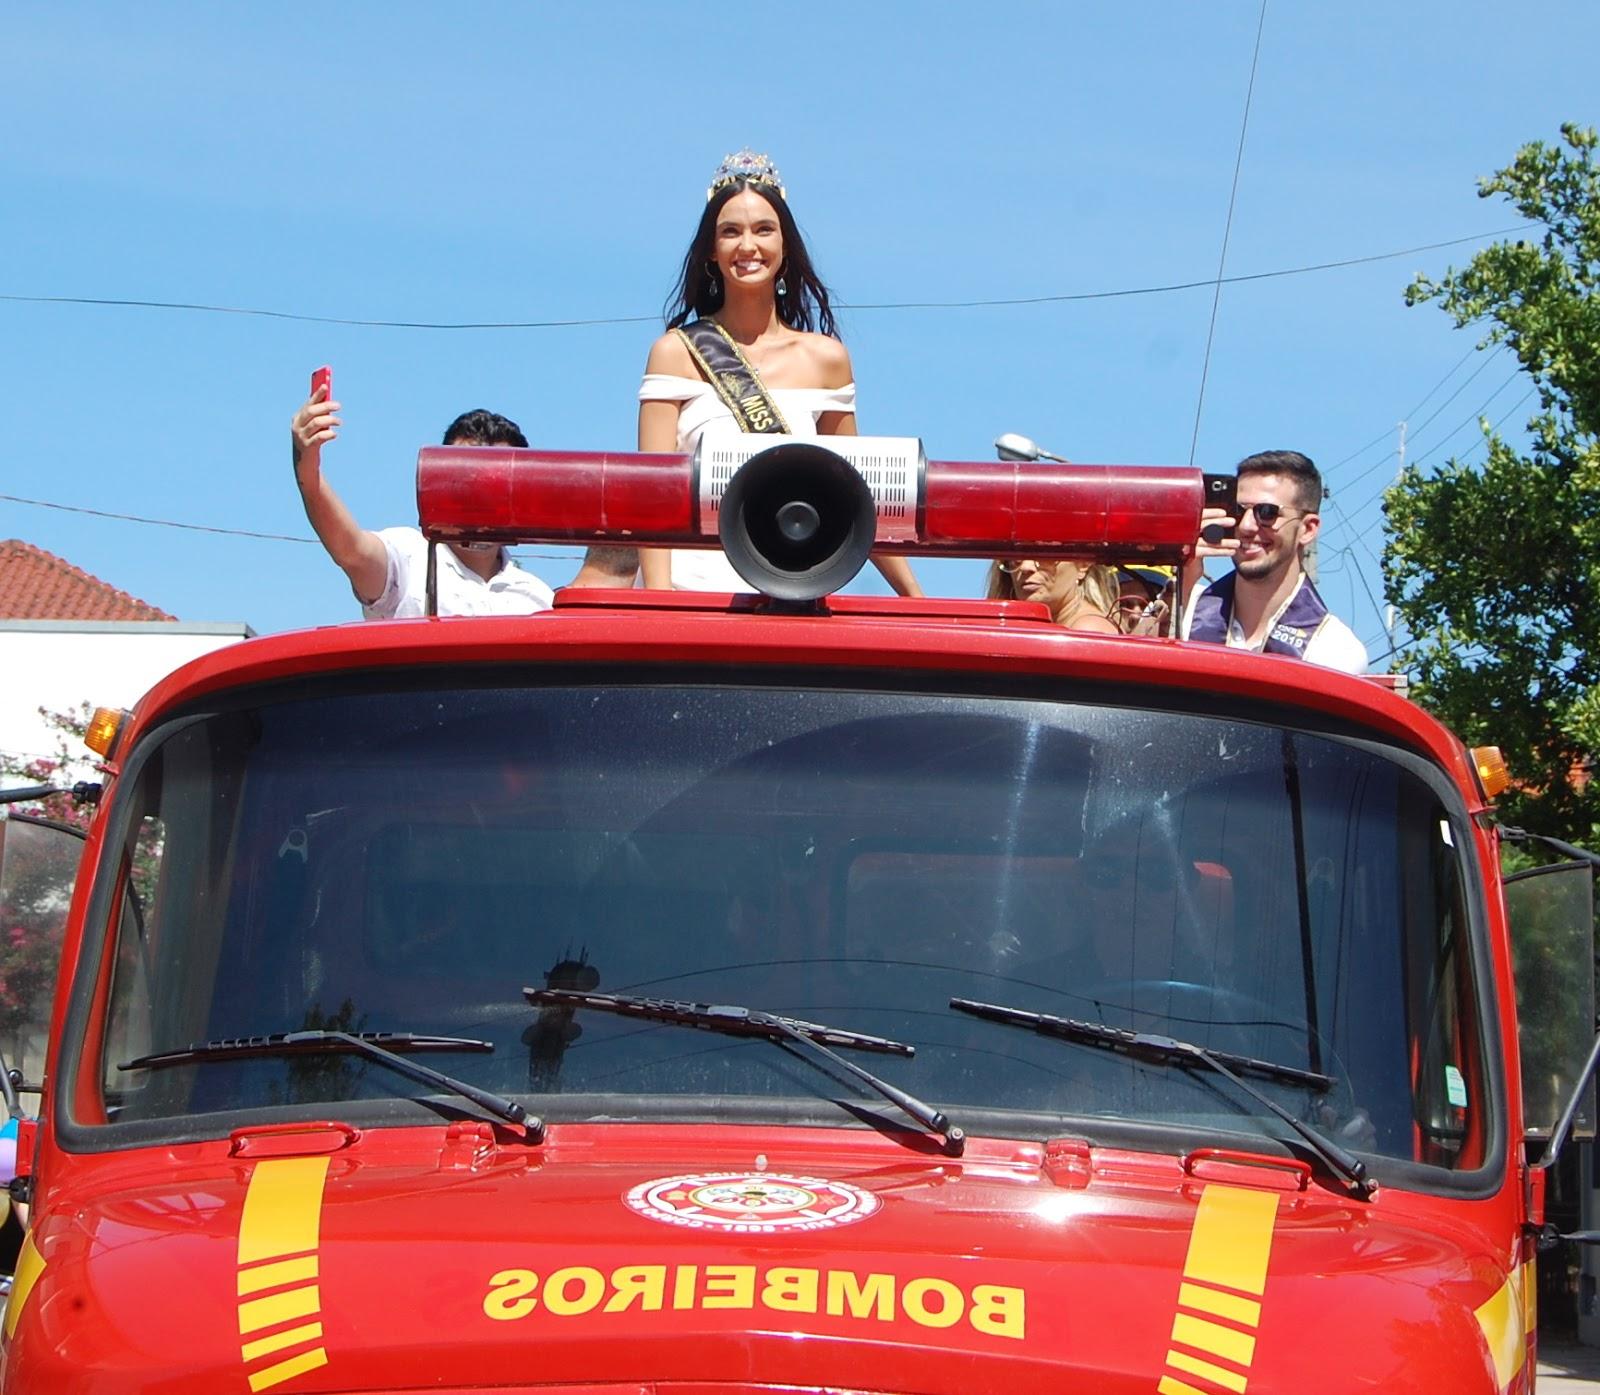 bianca scheren, top 5 de miss brasil universo 2019. - Página 5 Dsc_0027